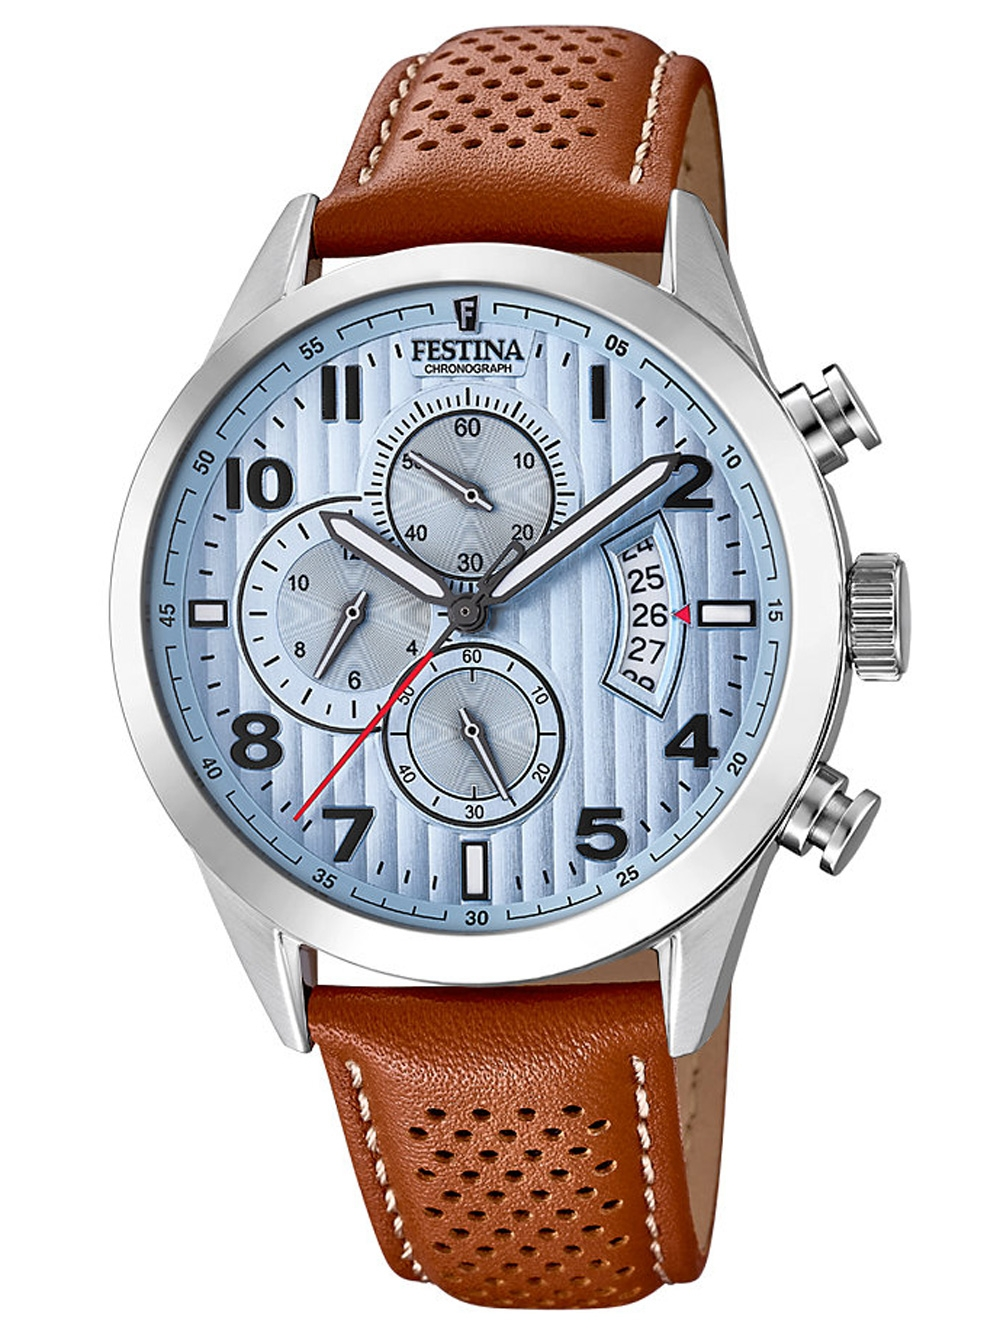 Festina F20271/4 Sport Chronograph 44mm 5ATM